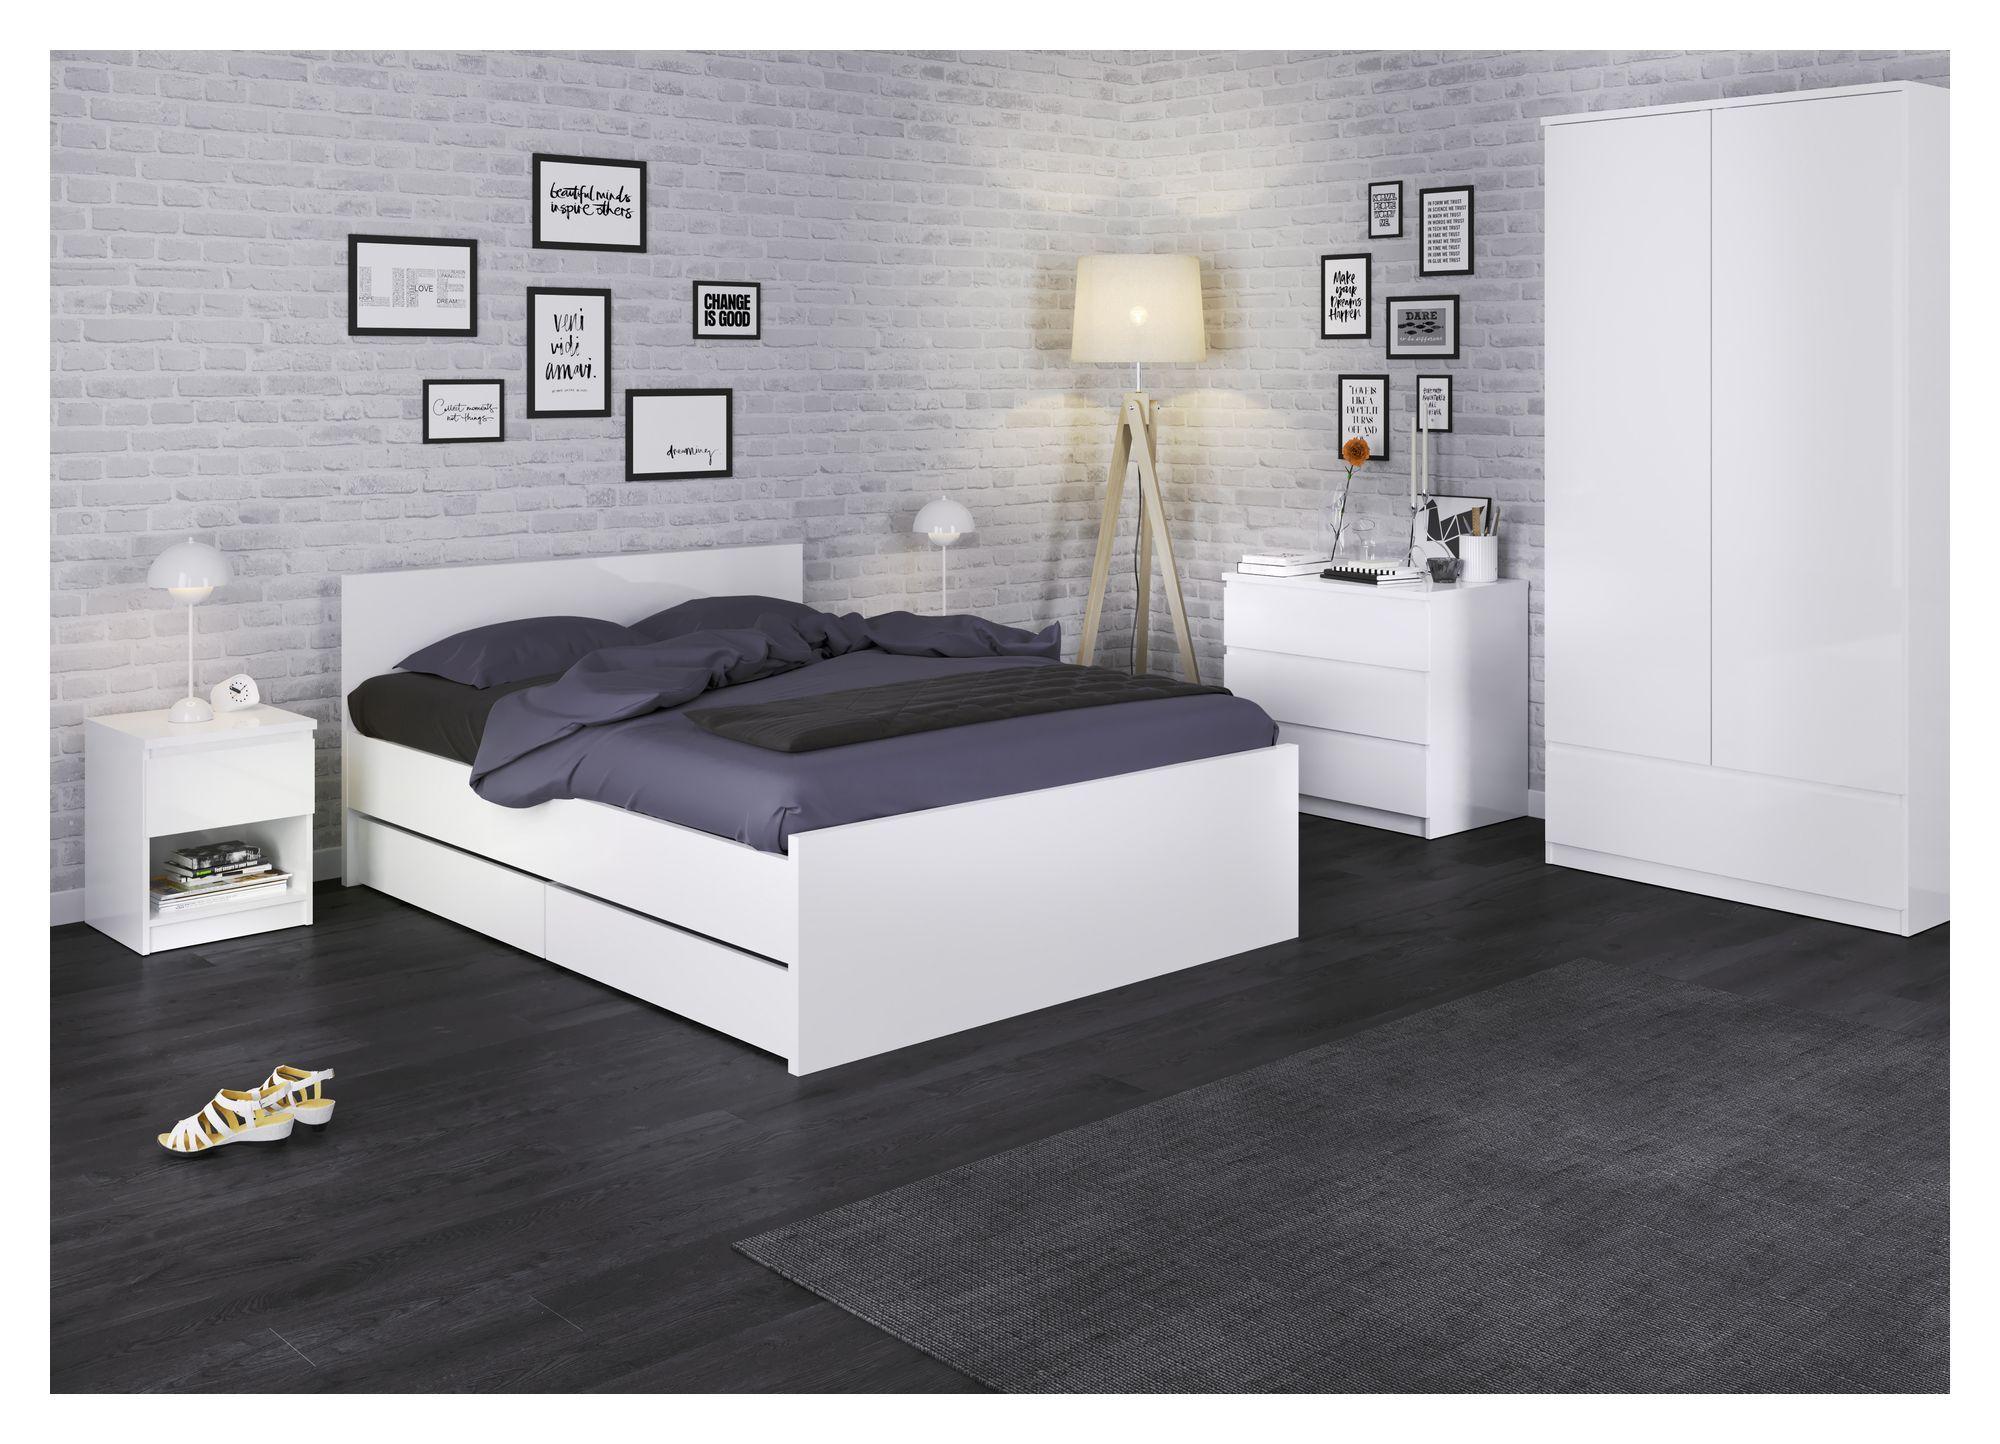 Naia Sengebord - Hvid højglans m/hylde - Hvidt sengebord i højglans